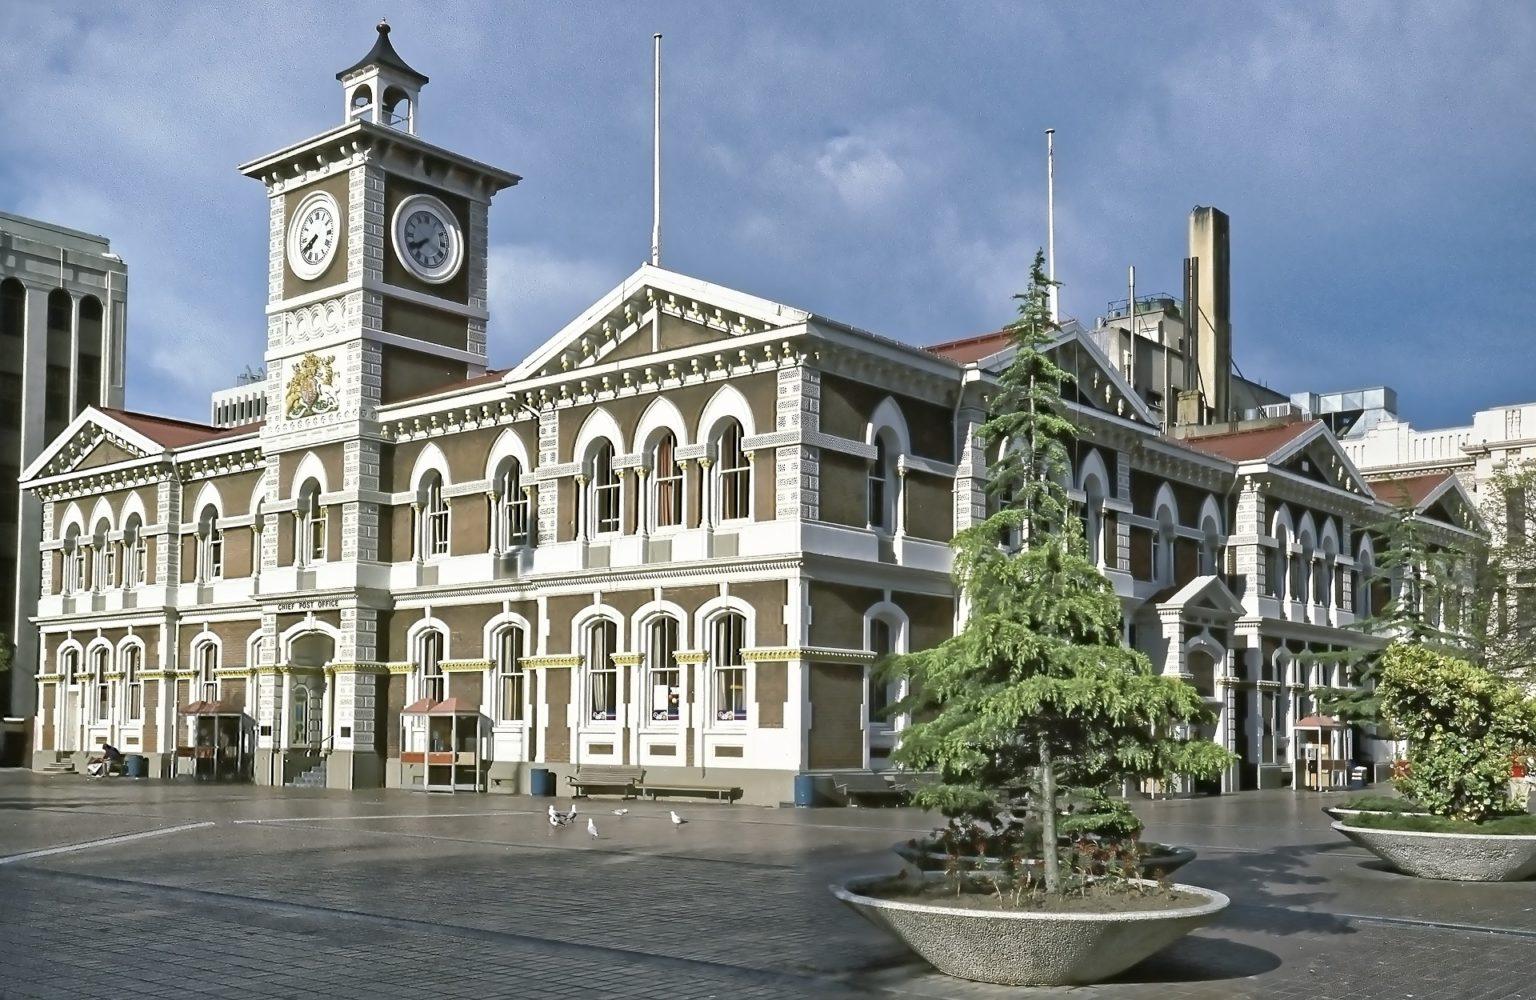 Walking tour in Christchurch